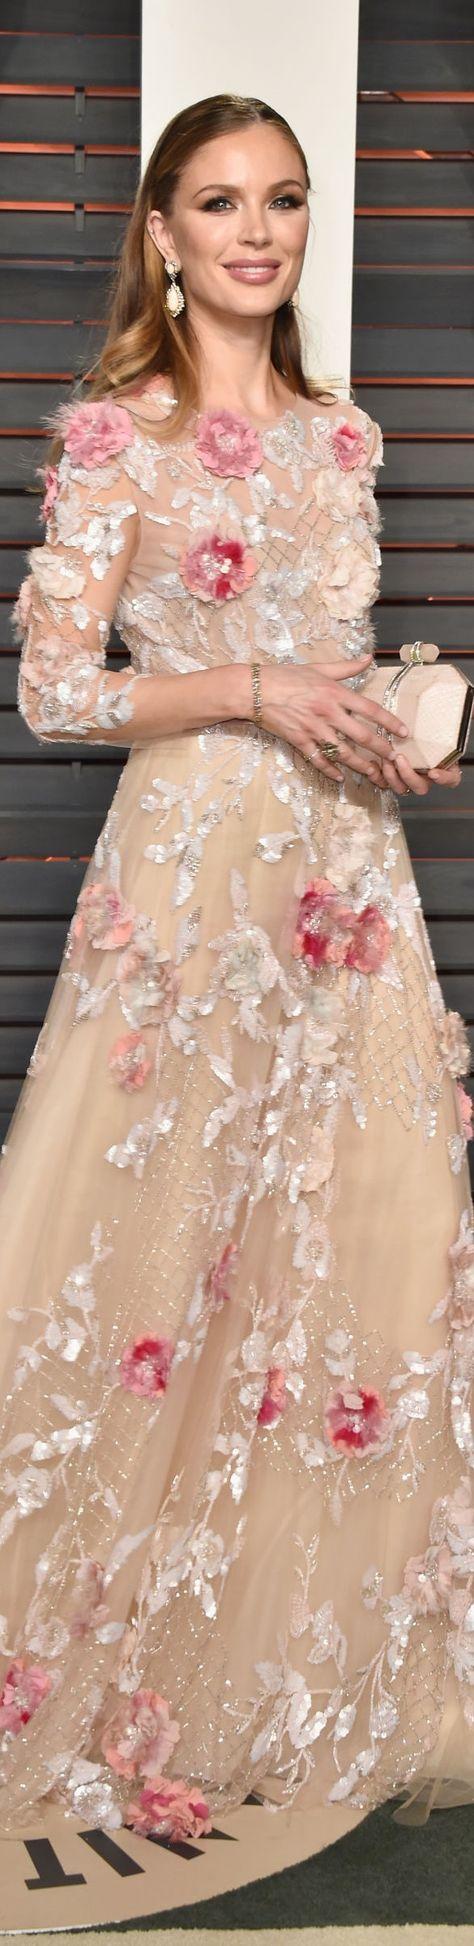 Georgina Chapman in Marchesa Oscar 2016 - floral luxury dress.